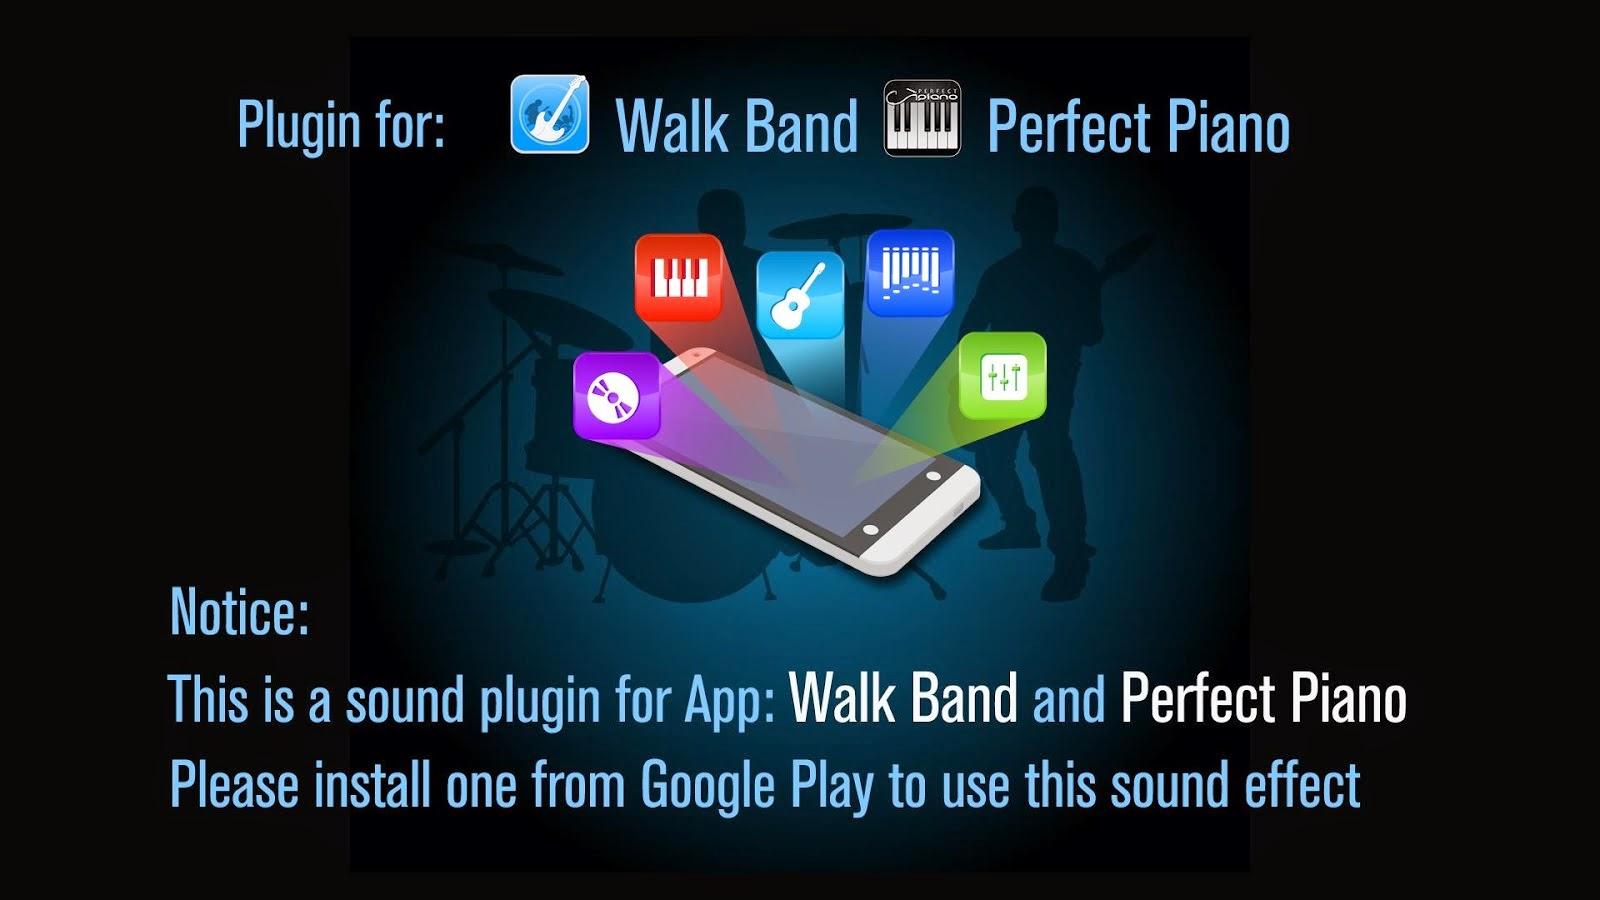 Flute Sound Plugin Android Apk Uygulama resimi